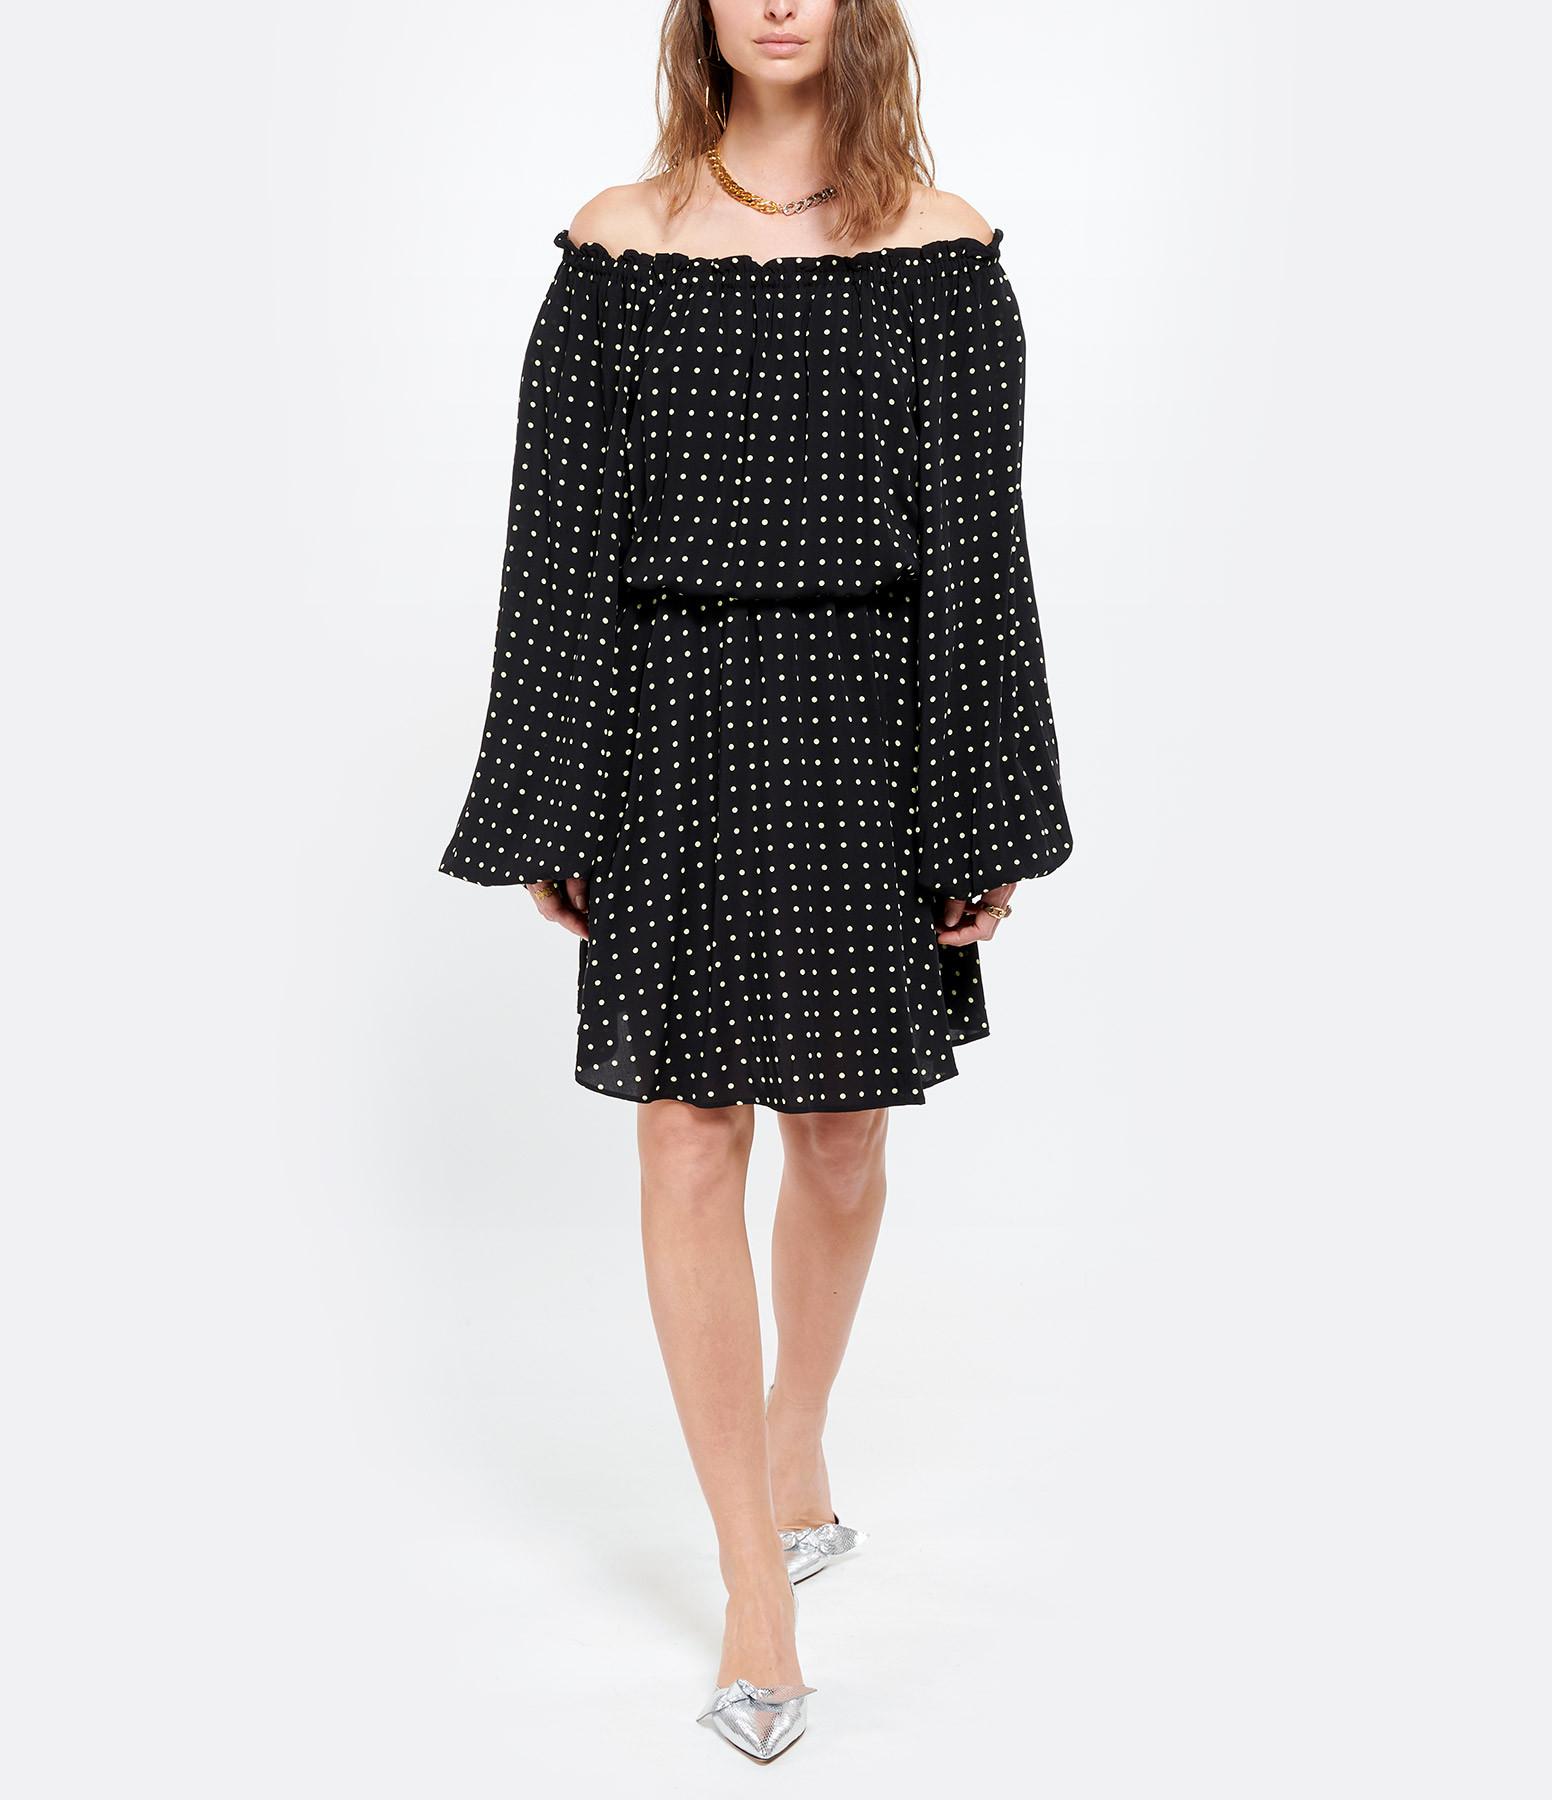 ROTATE - Robe Carly Noir